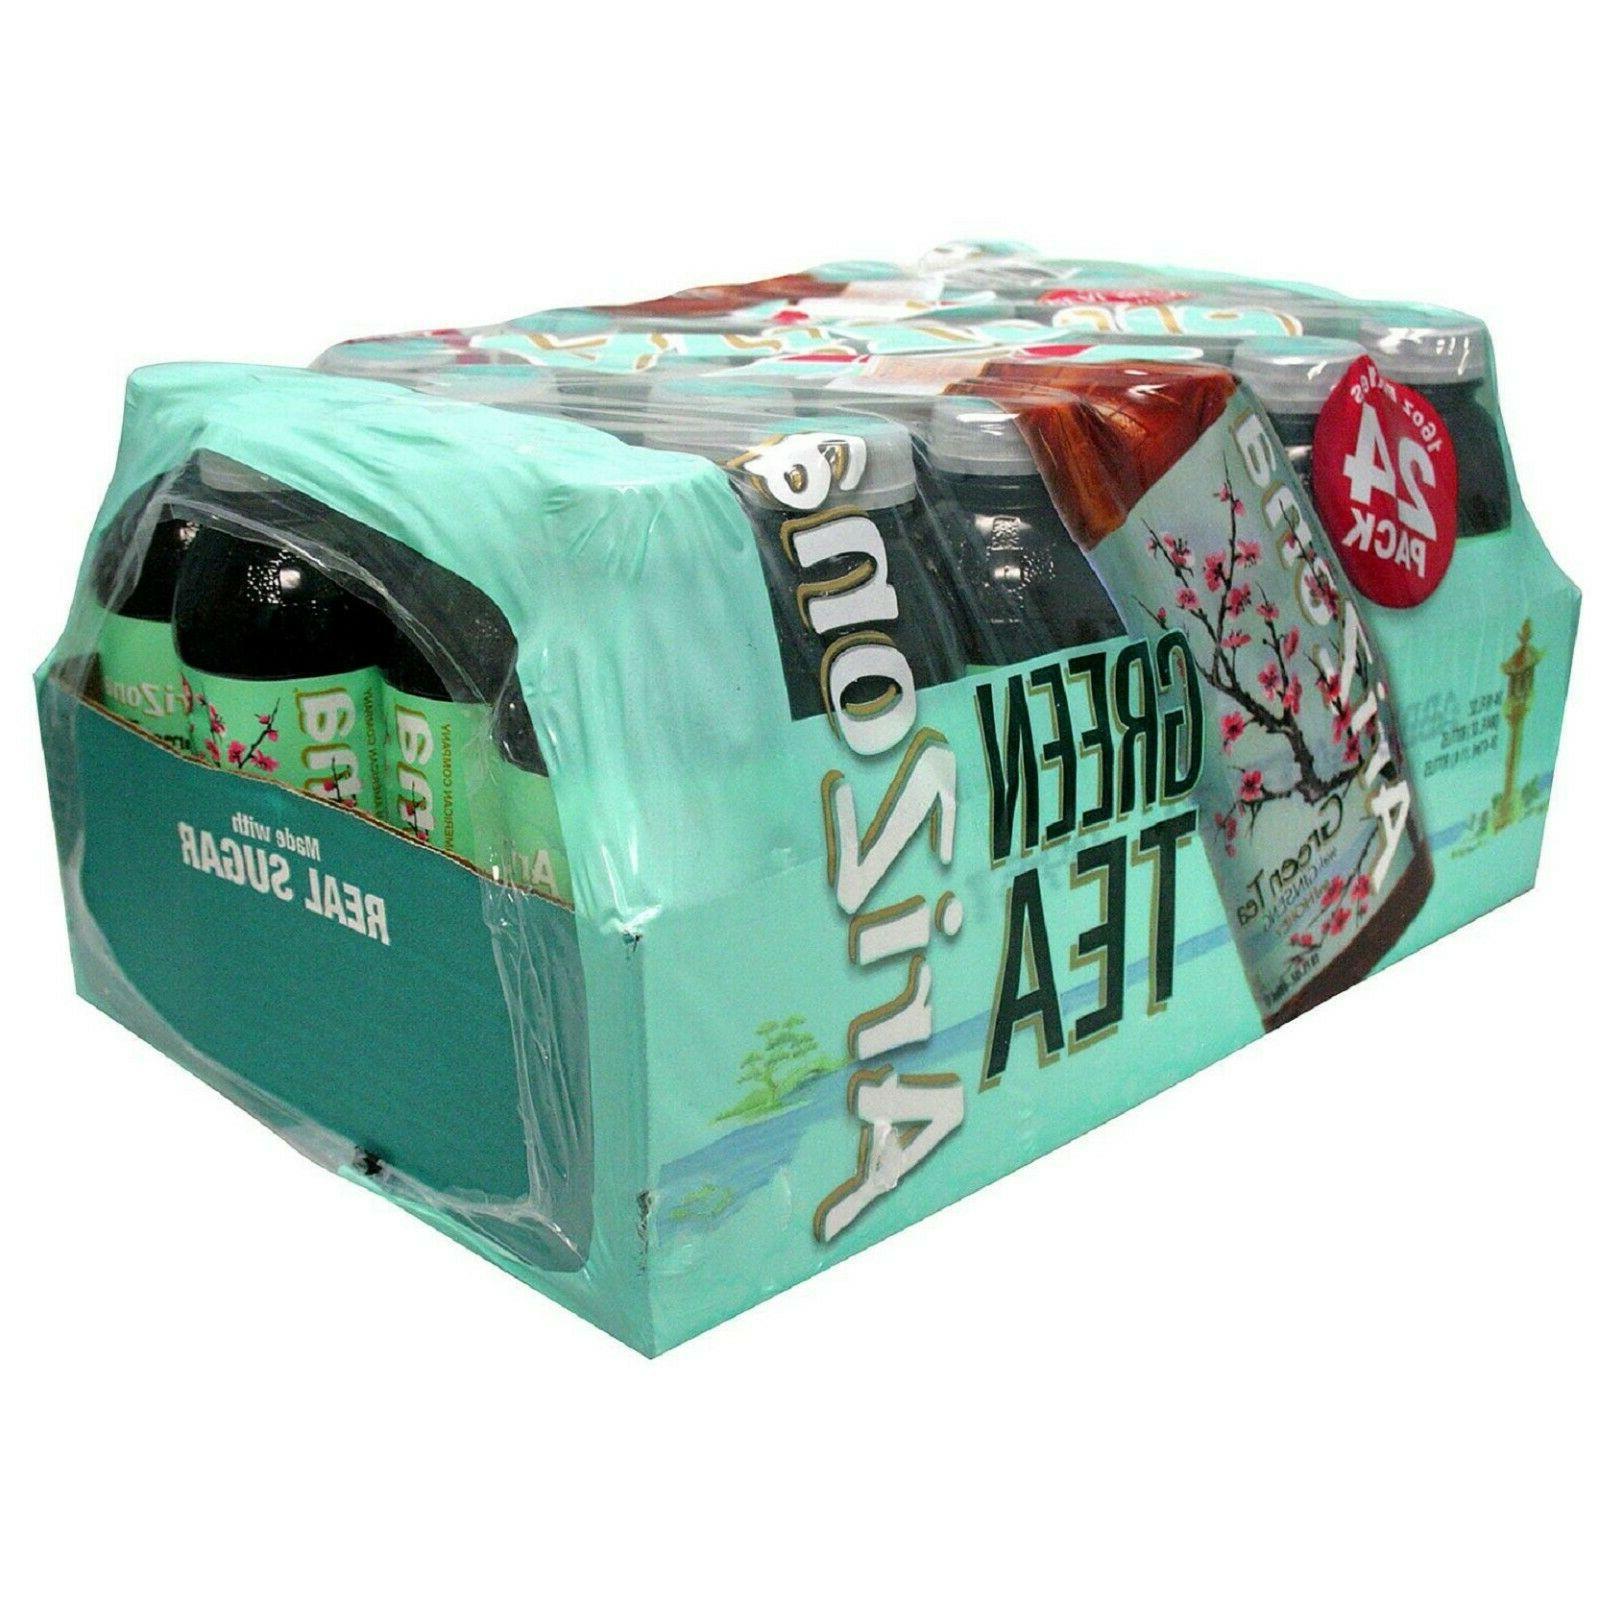 AriZona Tea Ginseng and fl bottle pk. Shipping